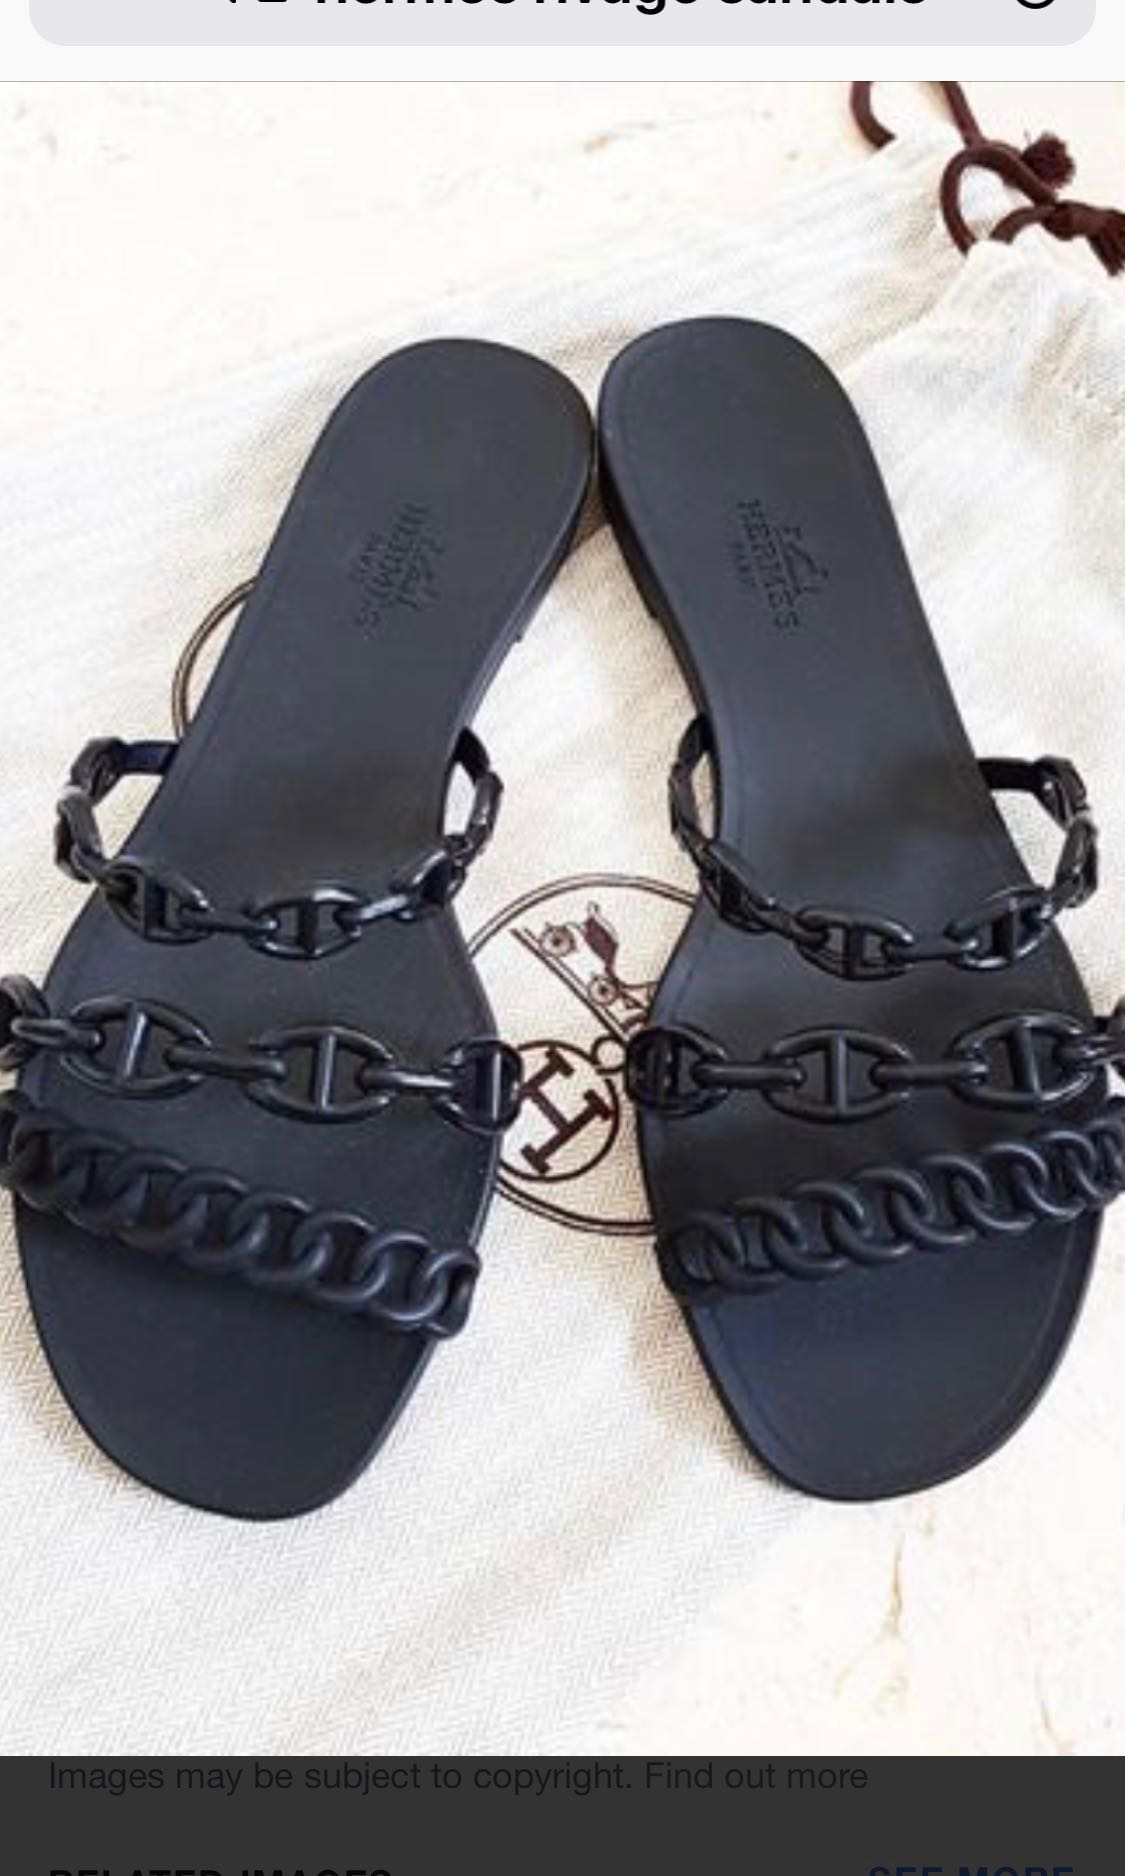 315acf4e9 Authentic Hermes rivage sandals size 37